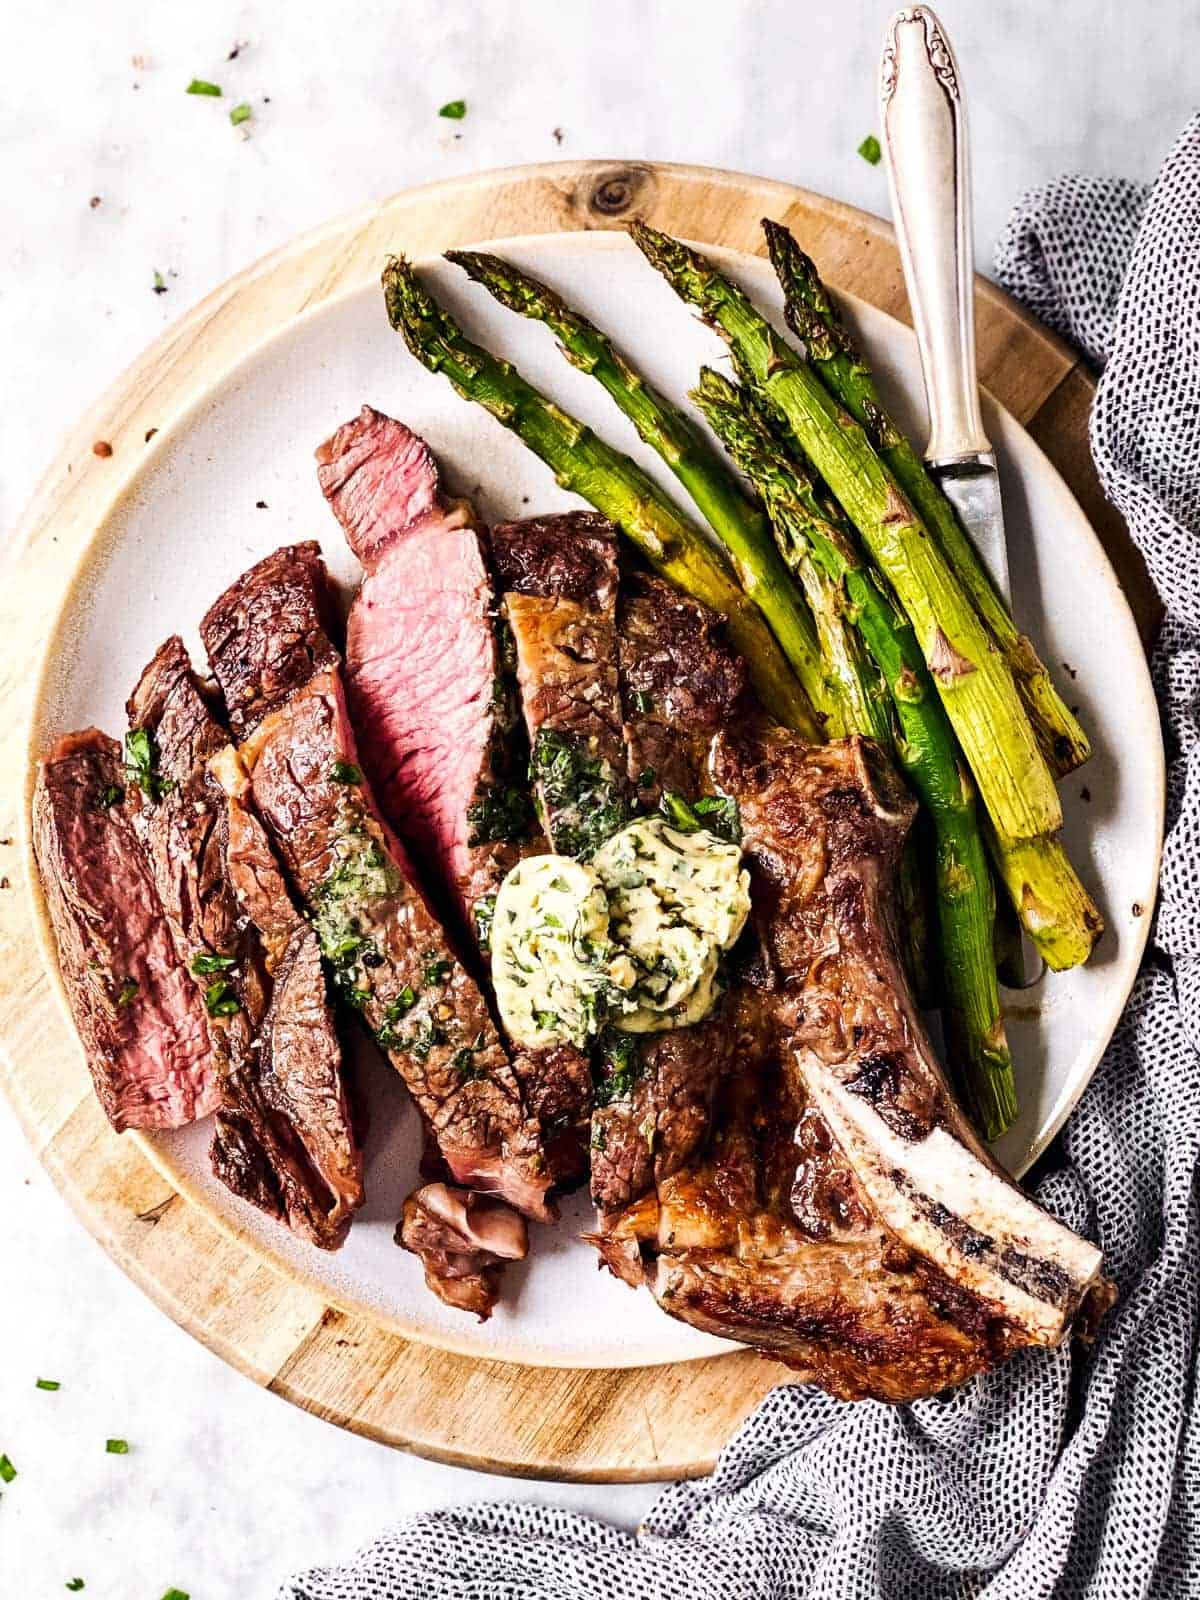 sliced steak on platter with asparagus